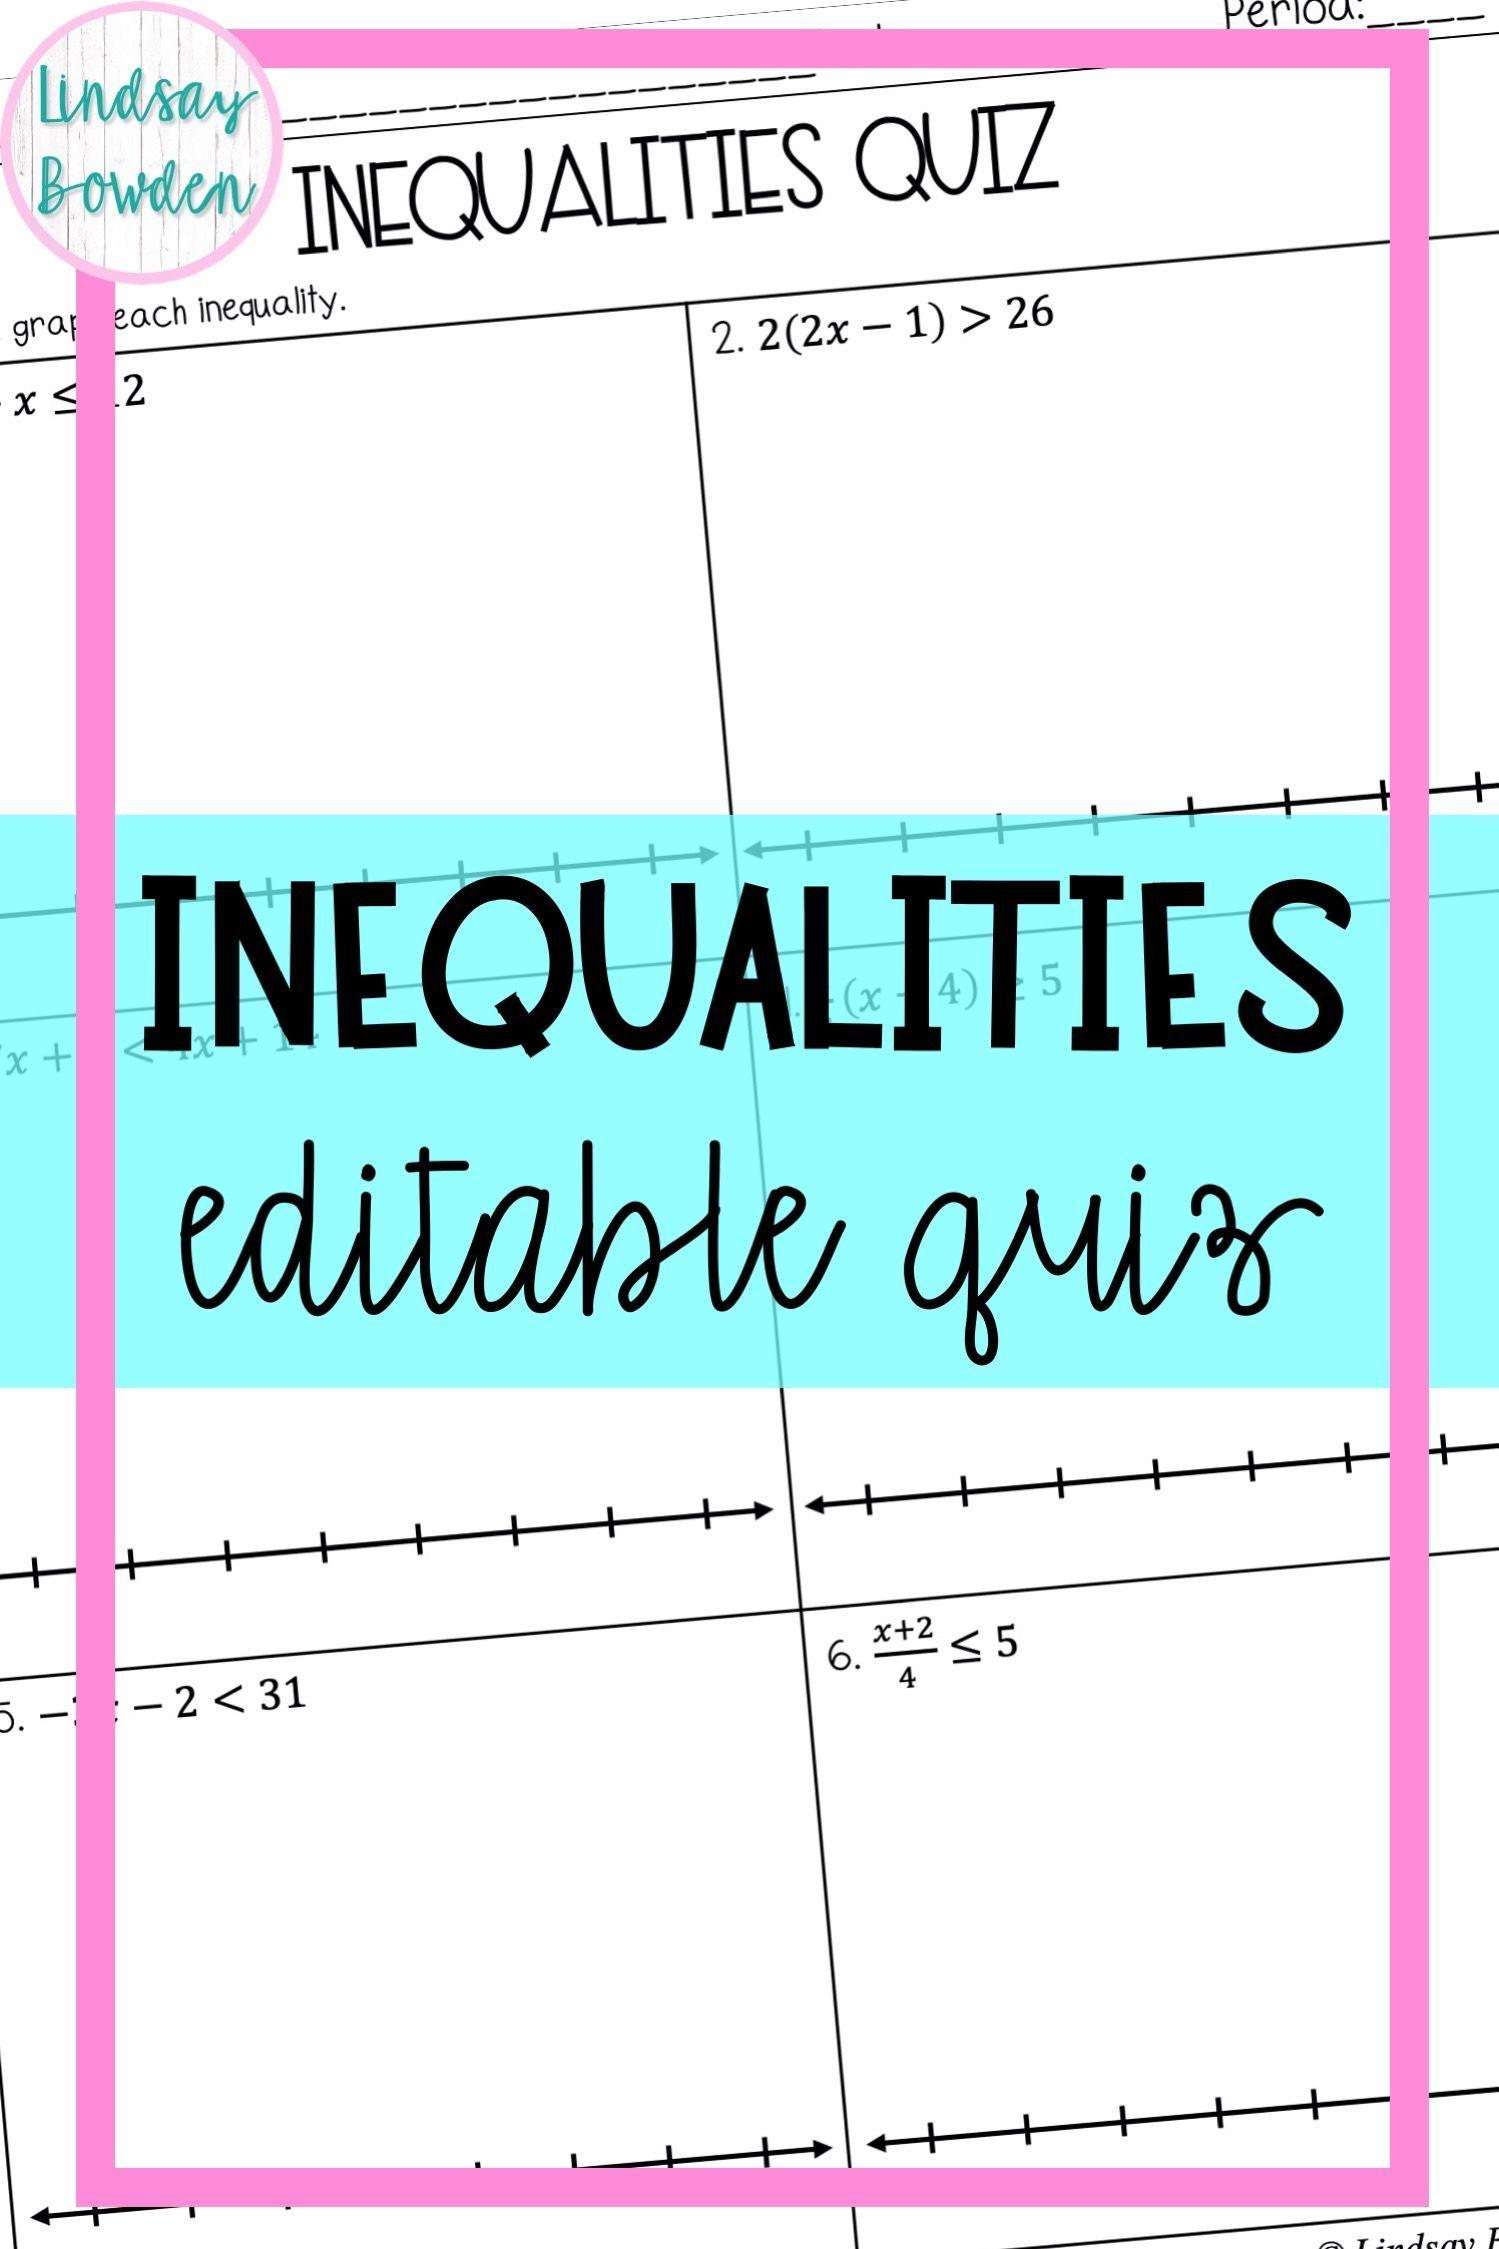 Inequalities Quiz Graphing Inequalities Word Problems Inequality Word Problems [ 2249 x 1499 Pixel ]